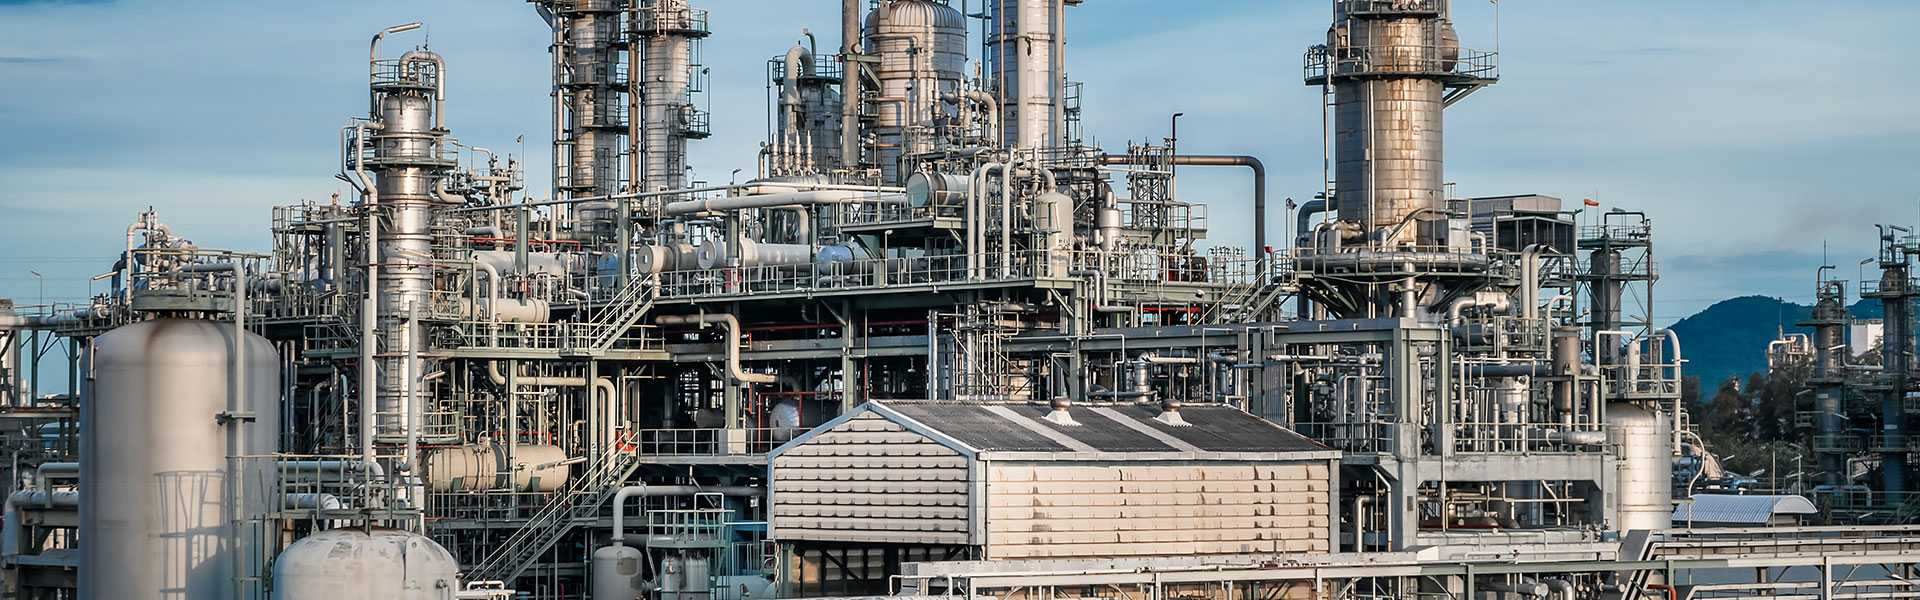 Accruent - Industries - Chemical - Hero